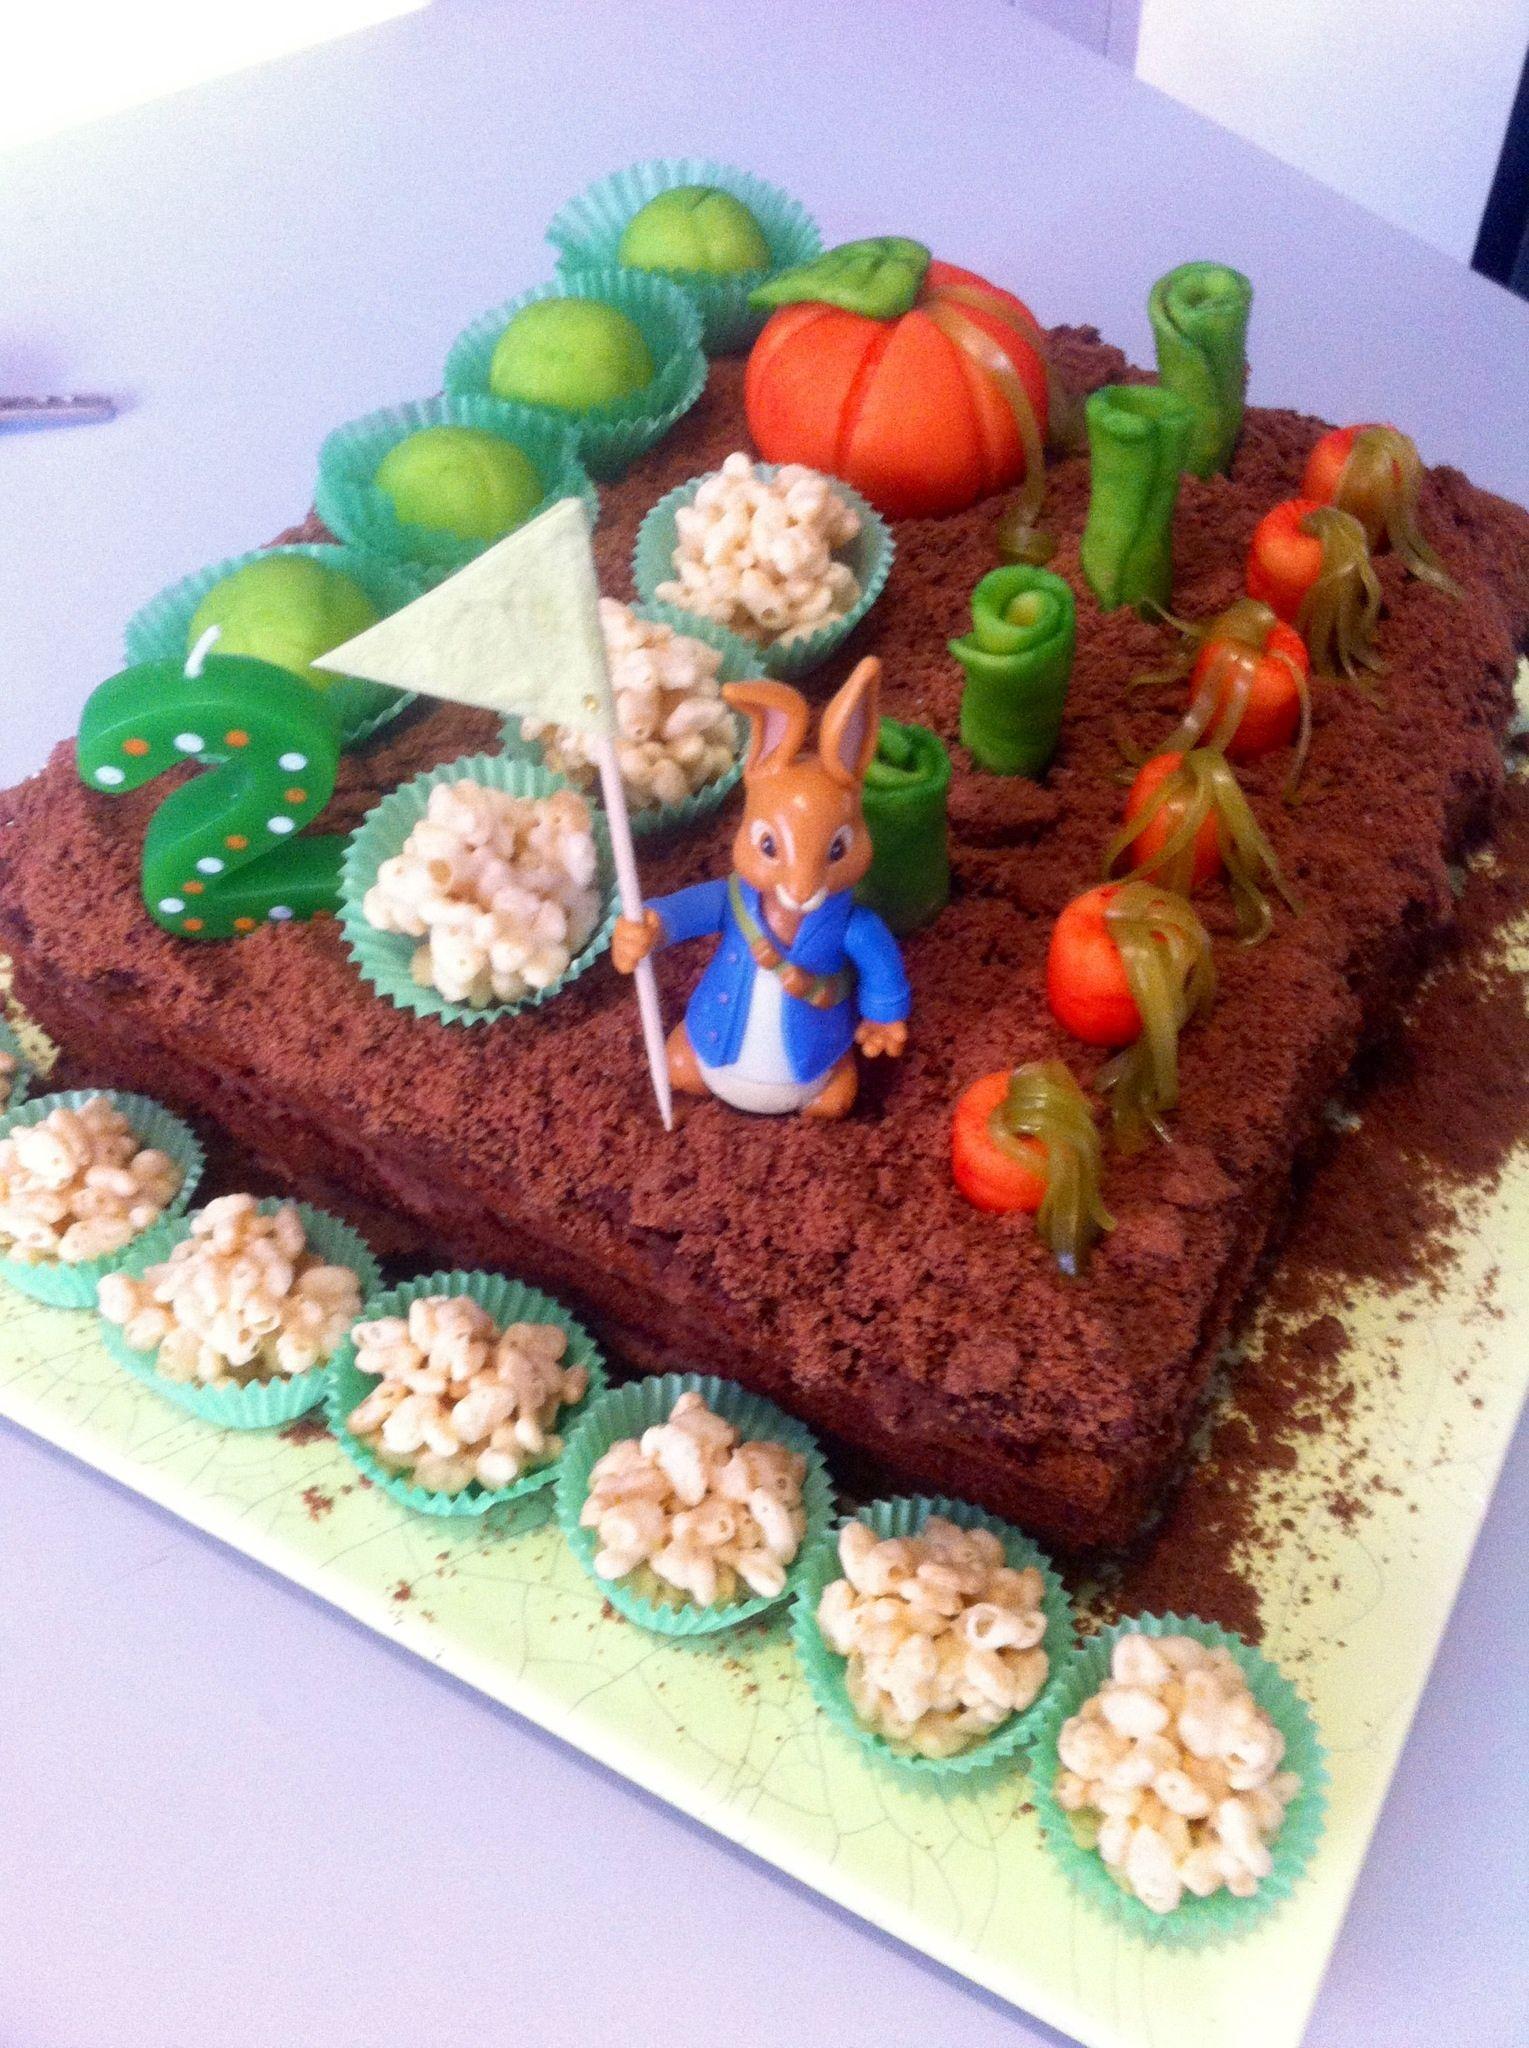 Peter Rabbit Mr McGregor's veg garden cake ...